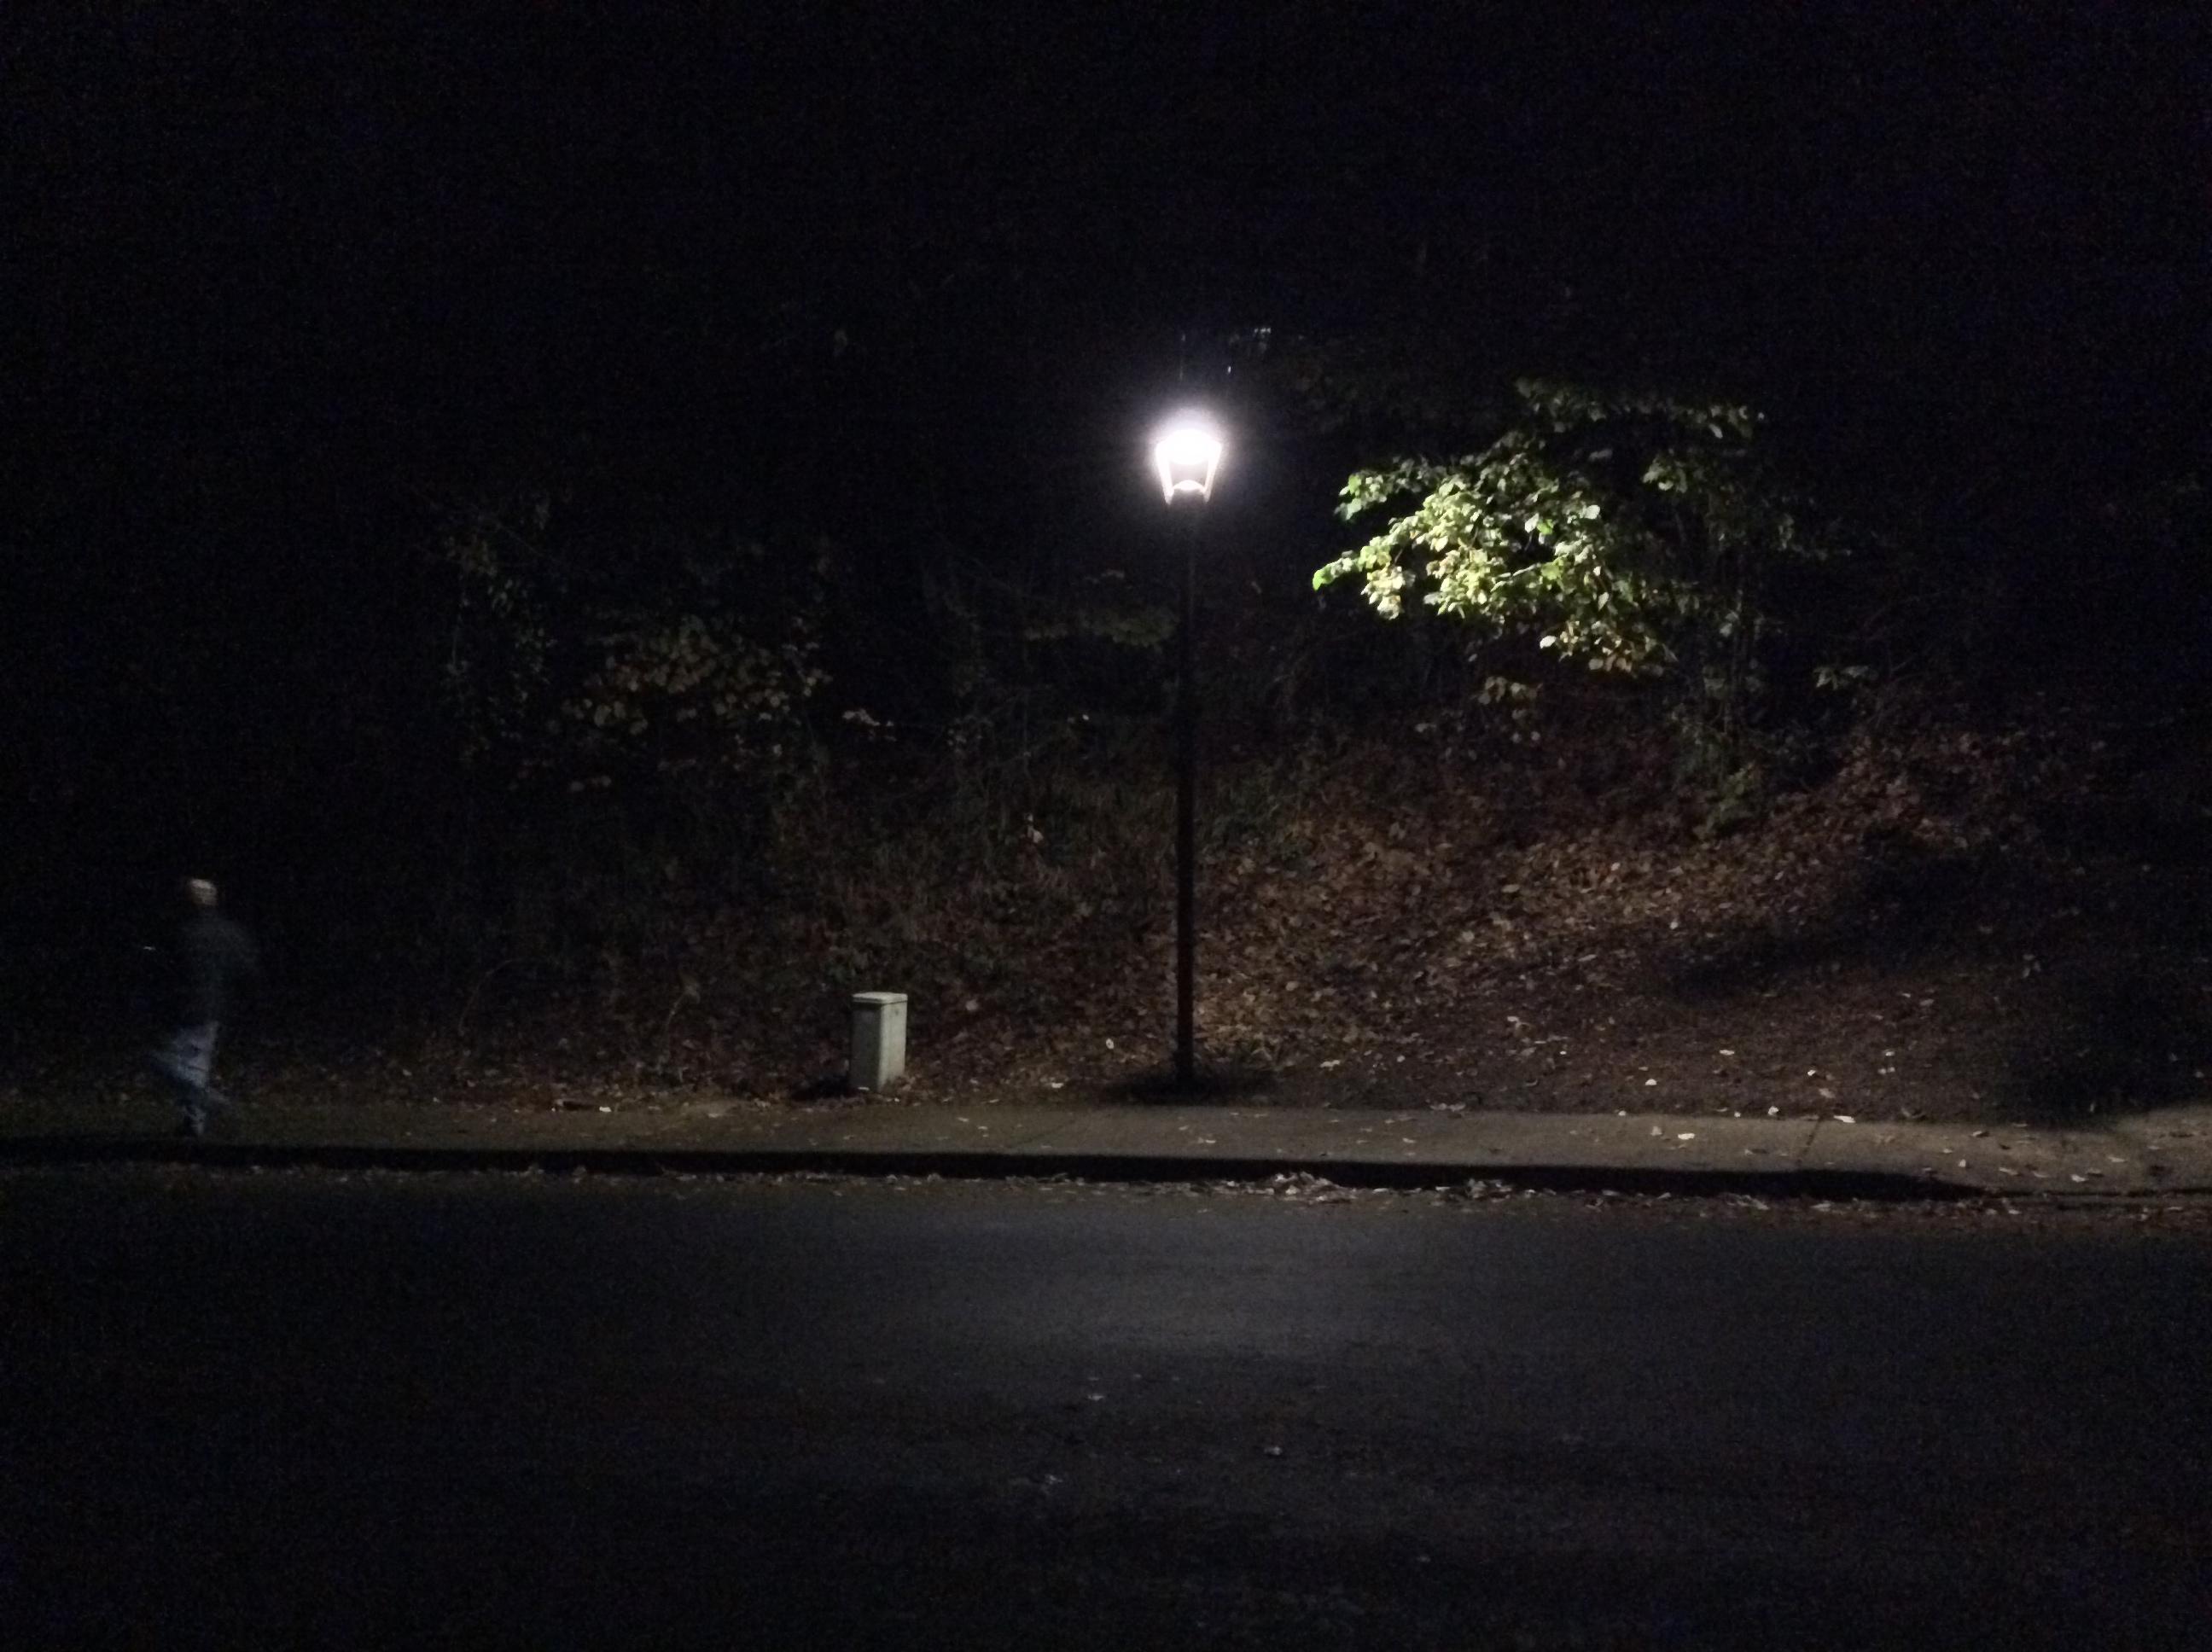 Eagle Crest 72 Watt LED